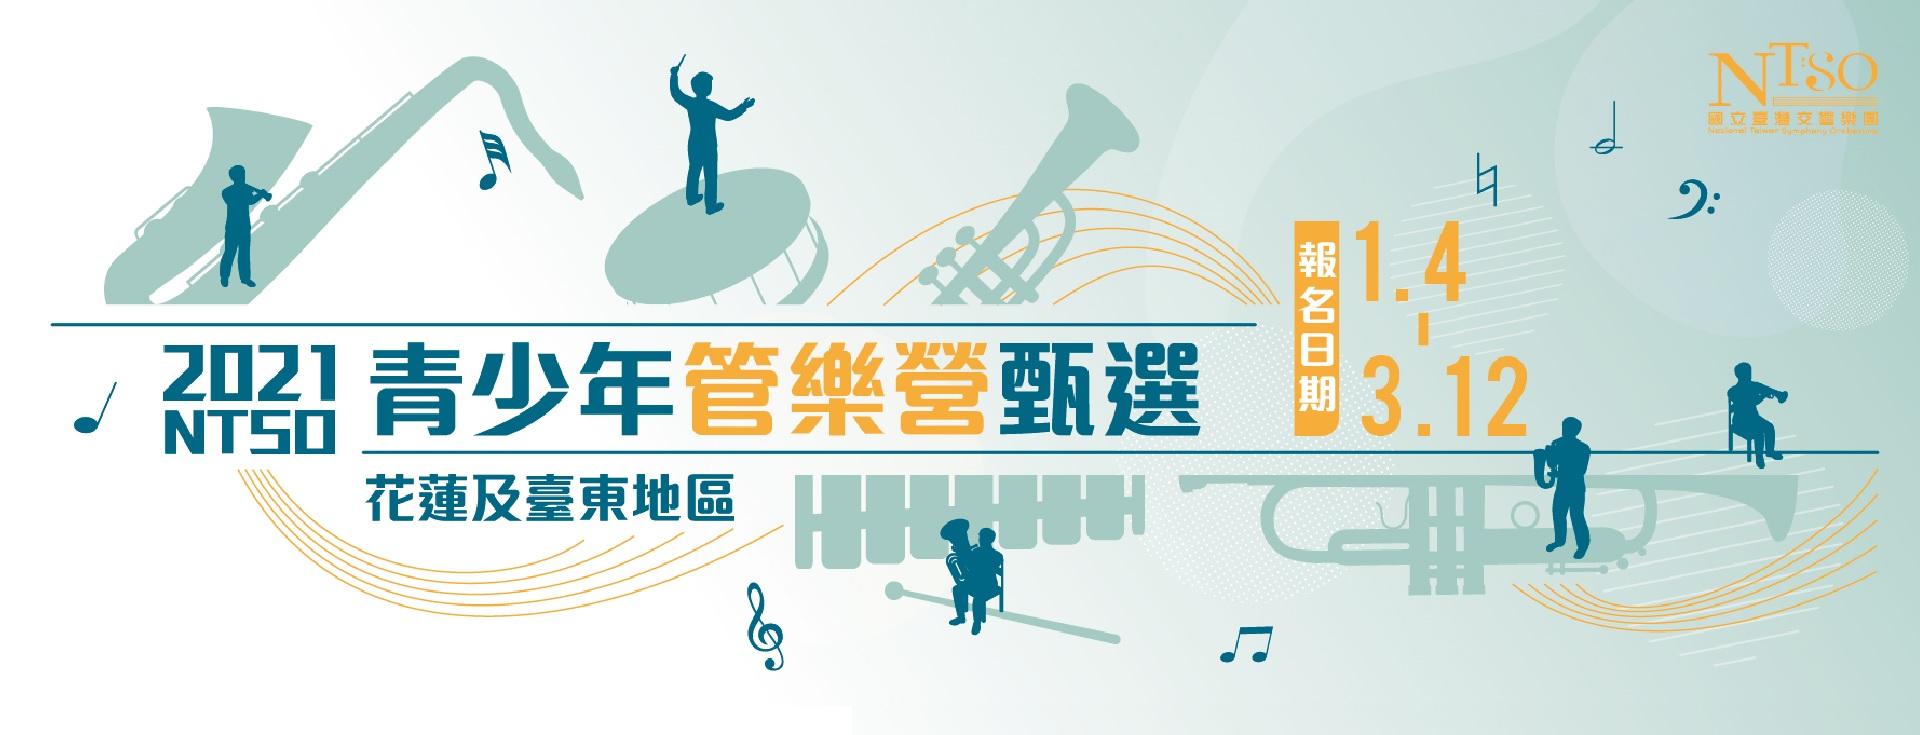 2021 NTSO花蓮及臺東地區青少年管樂營甄選